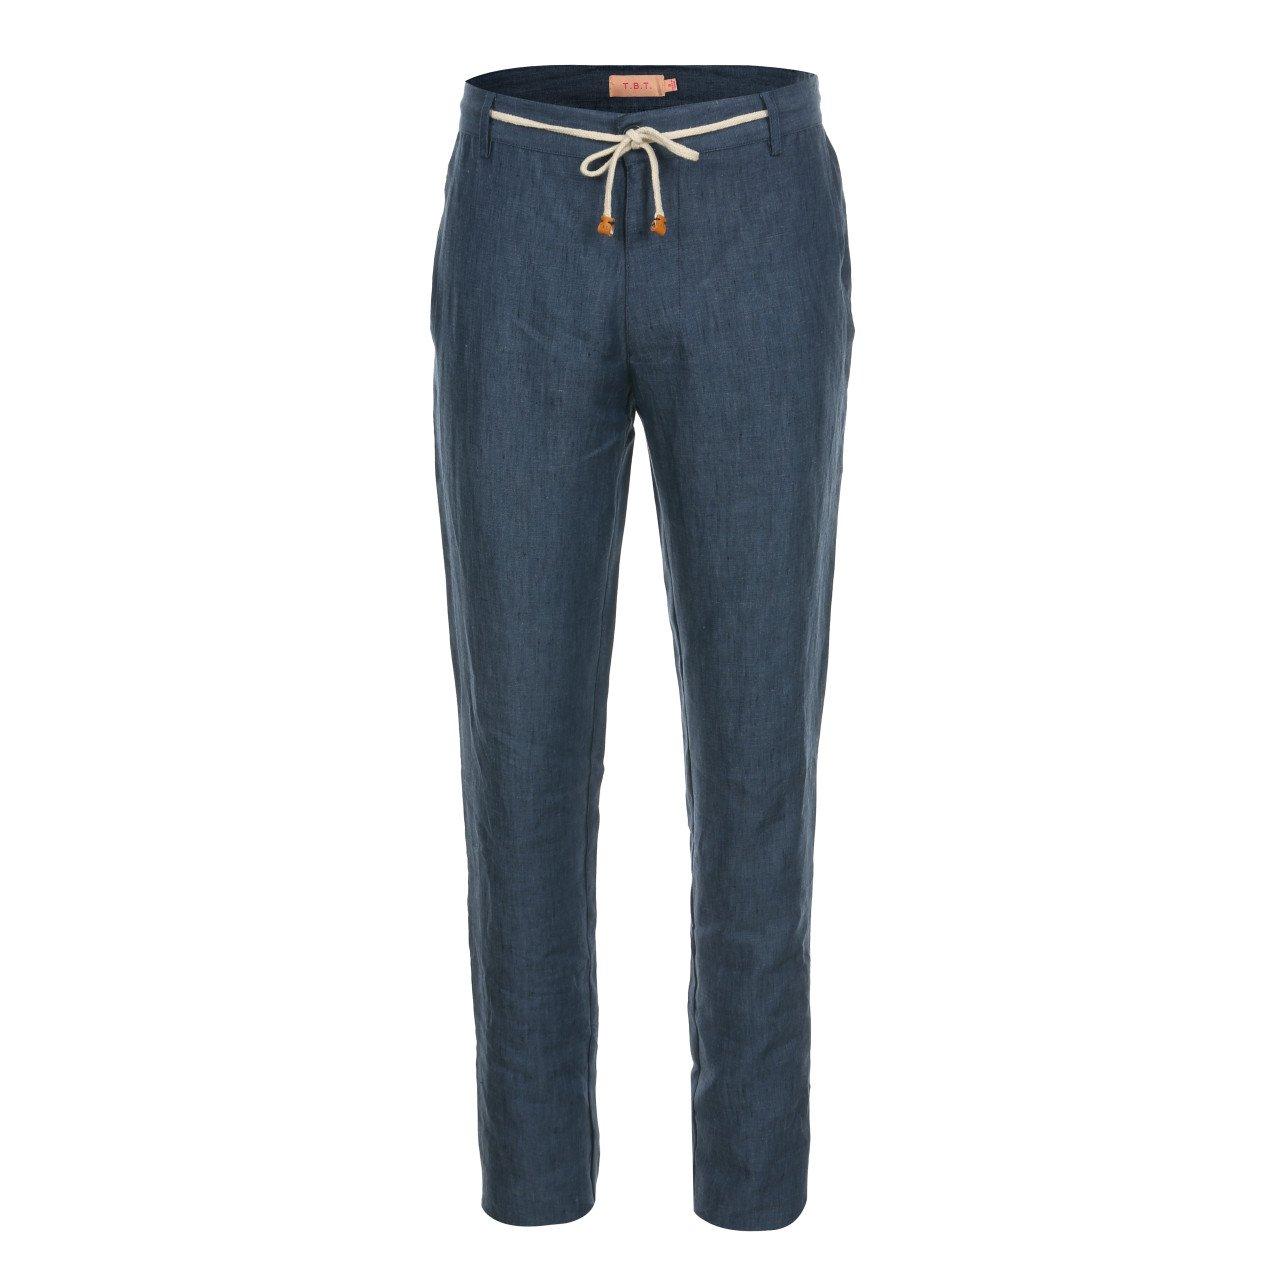 T.B.T. Men's Casual Slim Straight Linen Pants Waist Drawstring Trim (A71P01-NAVY-M)